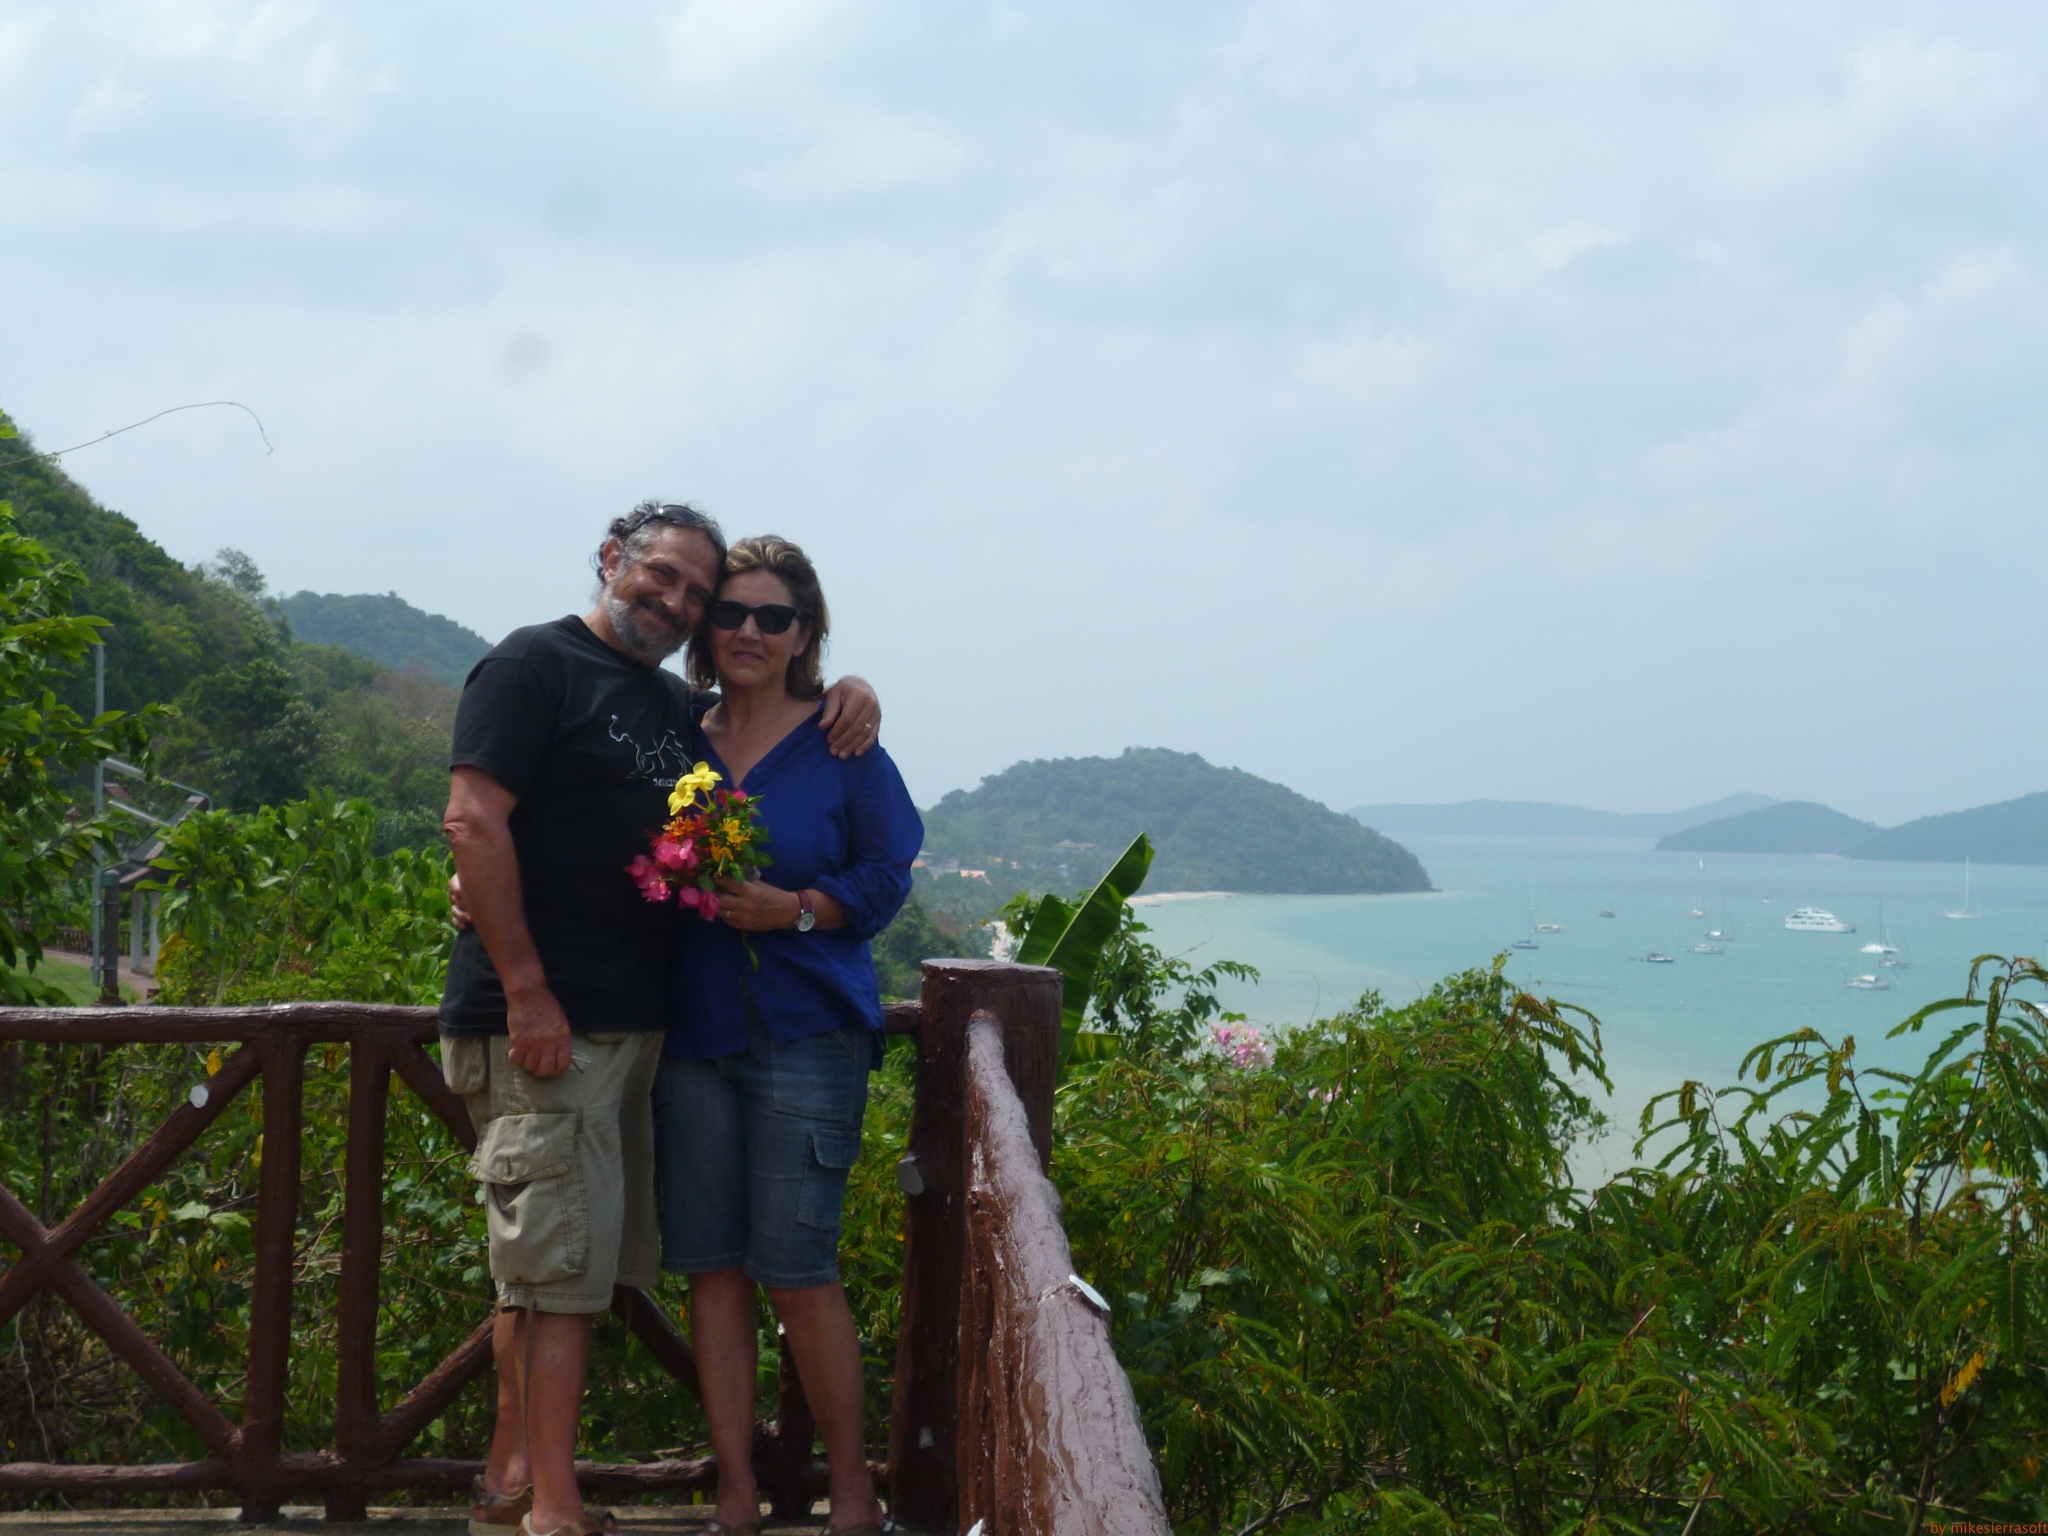 We in Phuket